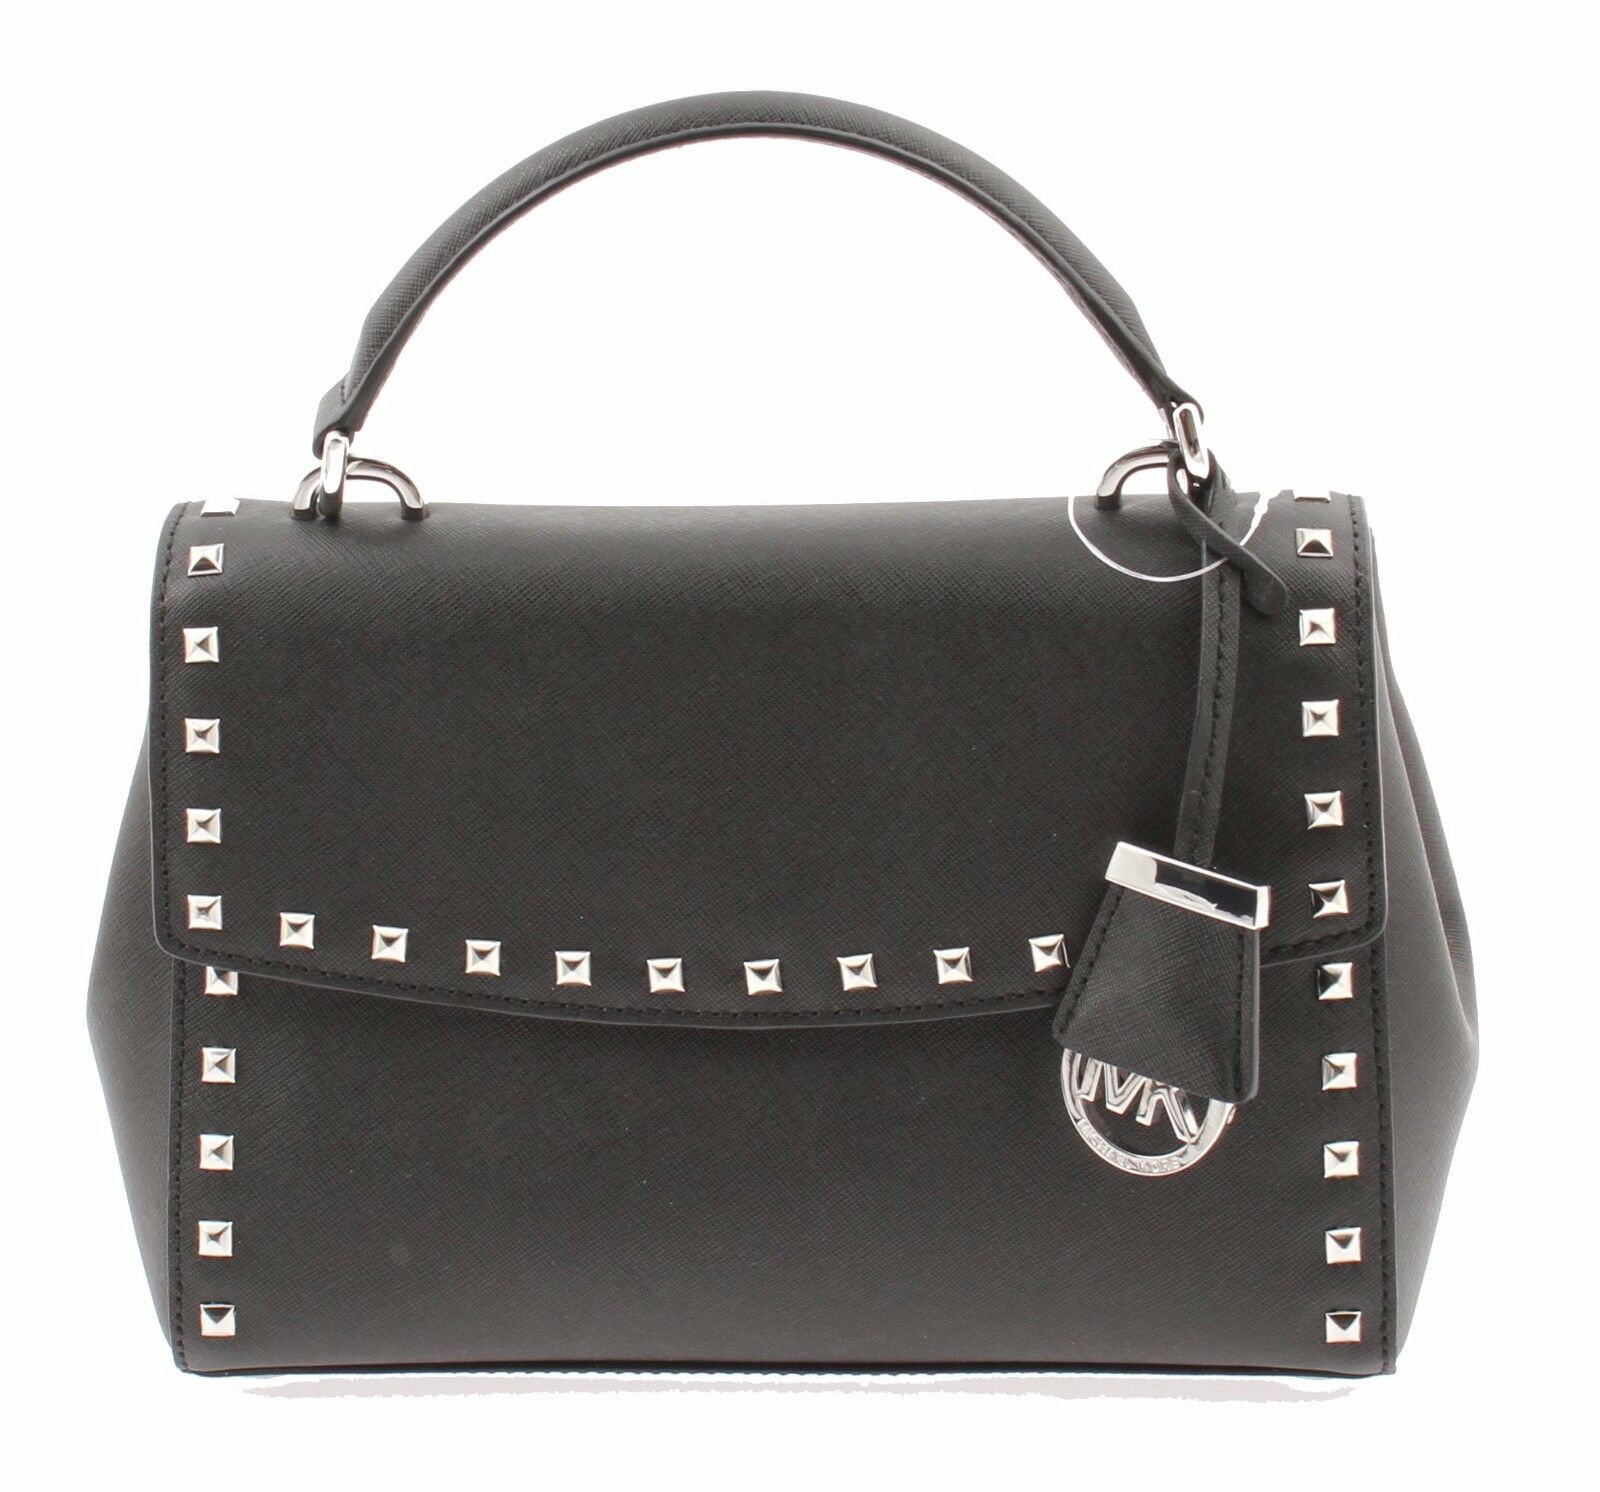 037c2e15a15bc Michael Kors Ava Stud 30t6sa6s1l Black Small Satchel Leather Bag ...